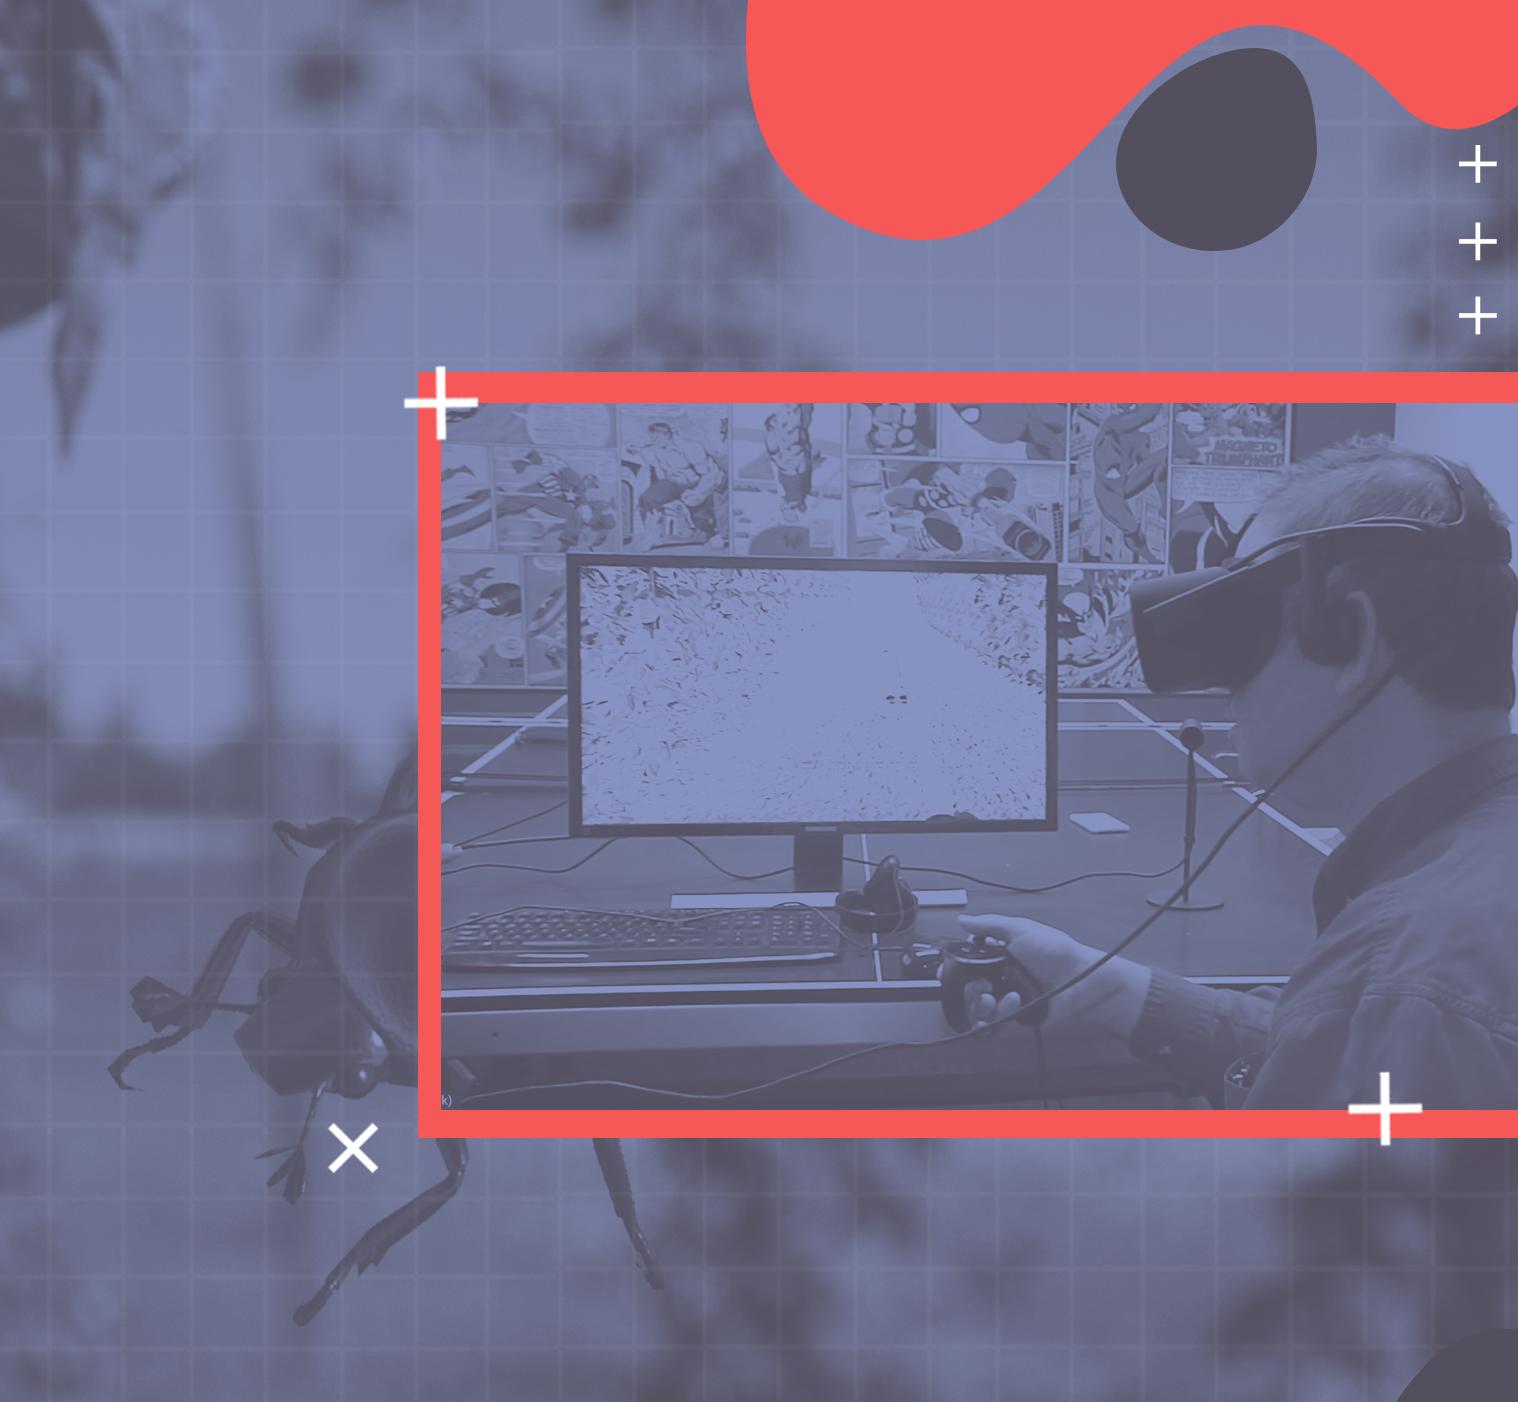 VR SCOUT - Hops - Grant-Funded, University Partnership, Community Focus